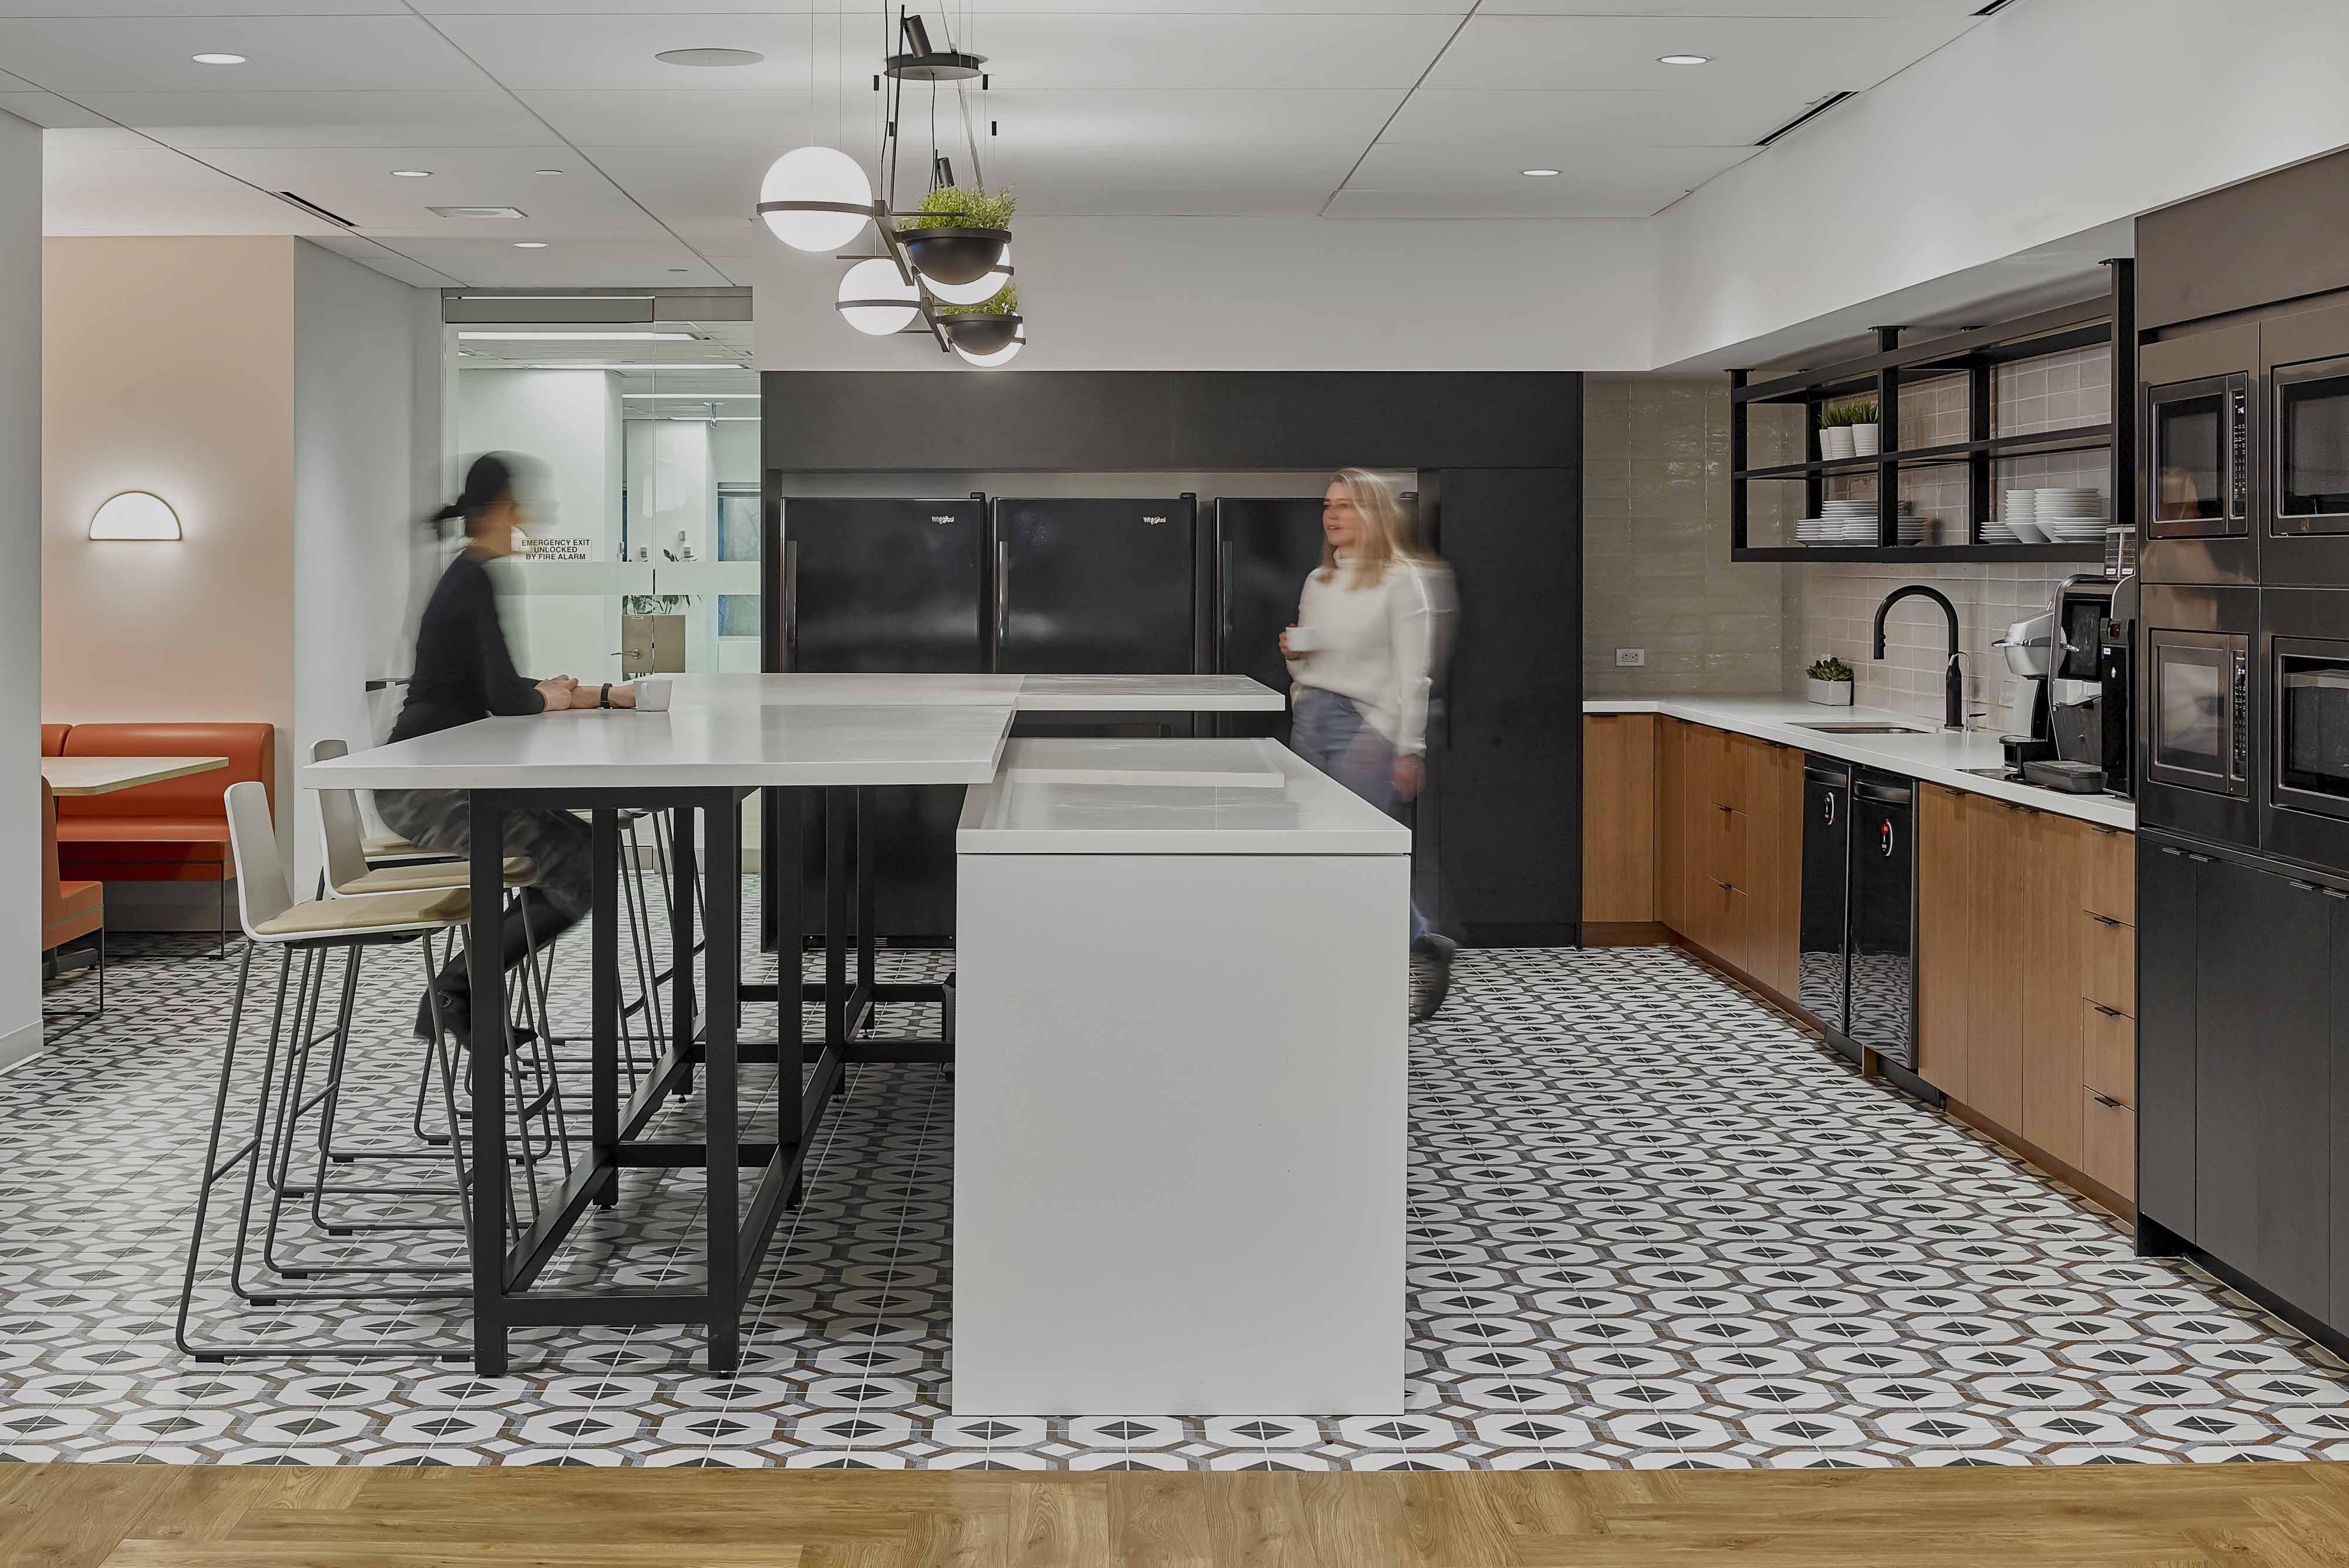 Top Interior Design Services Halifax, Vancouver, Toronto